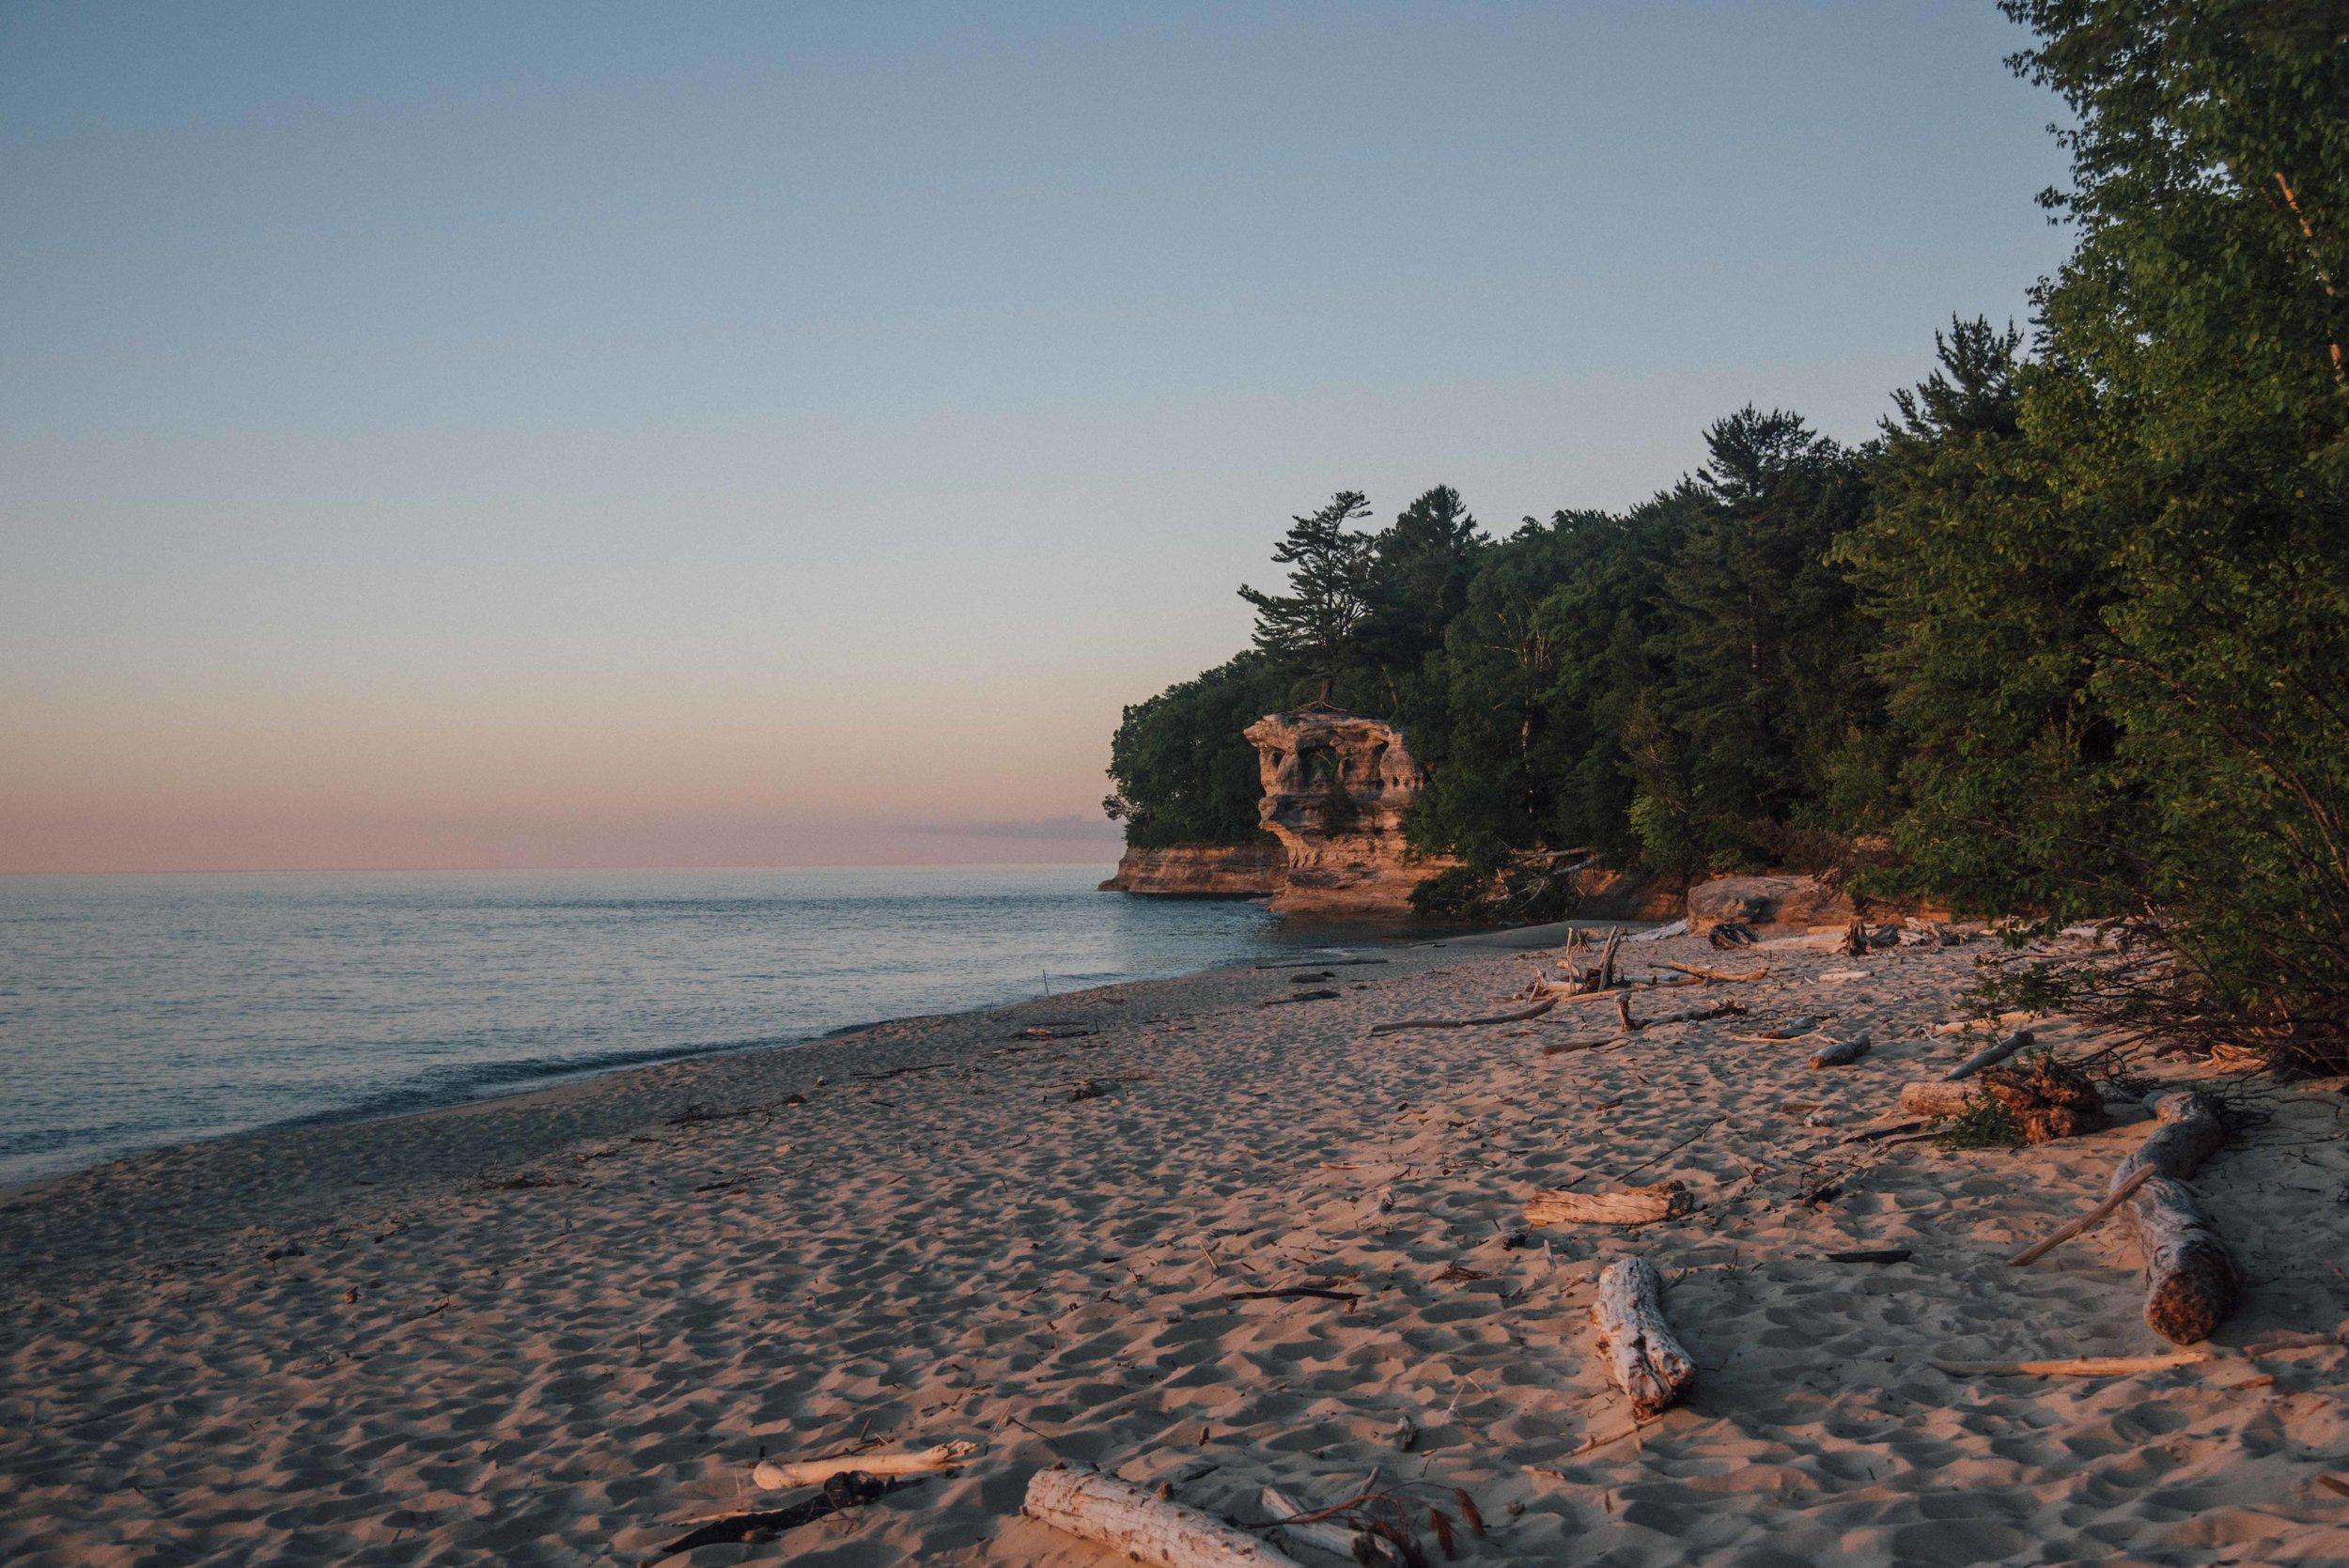 Pictured Rocks, MI, USA